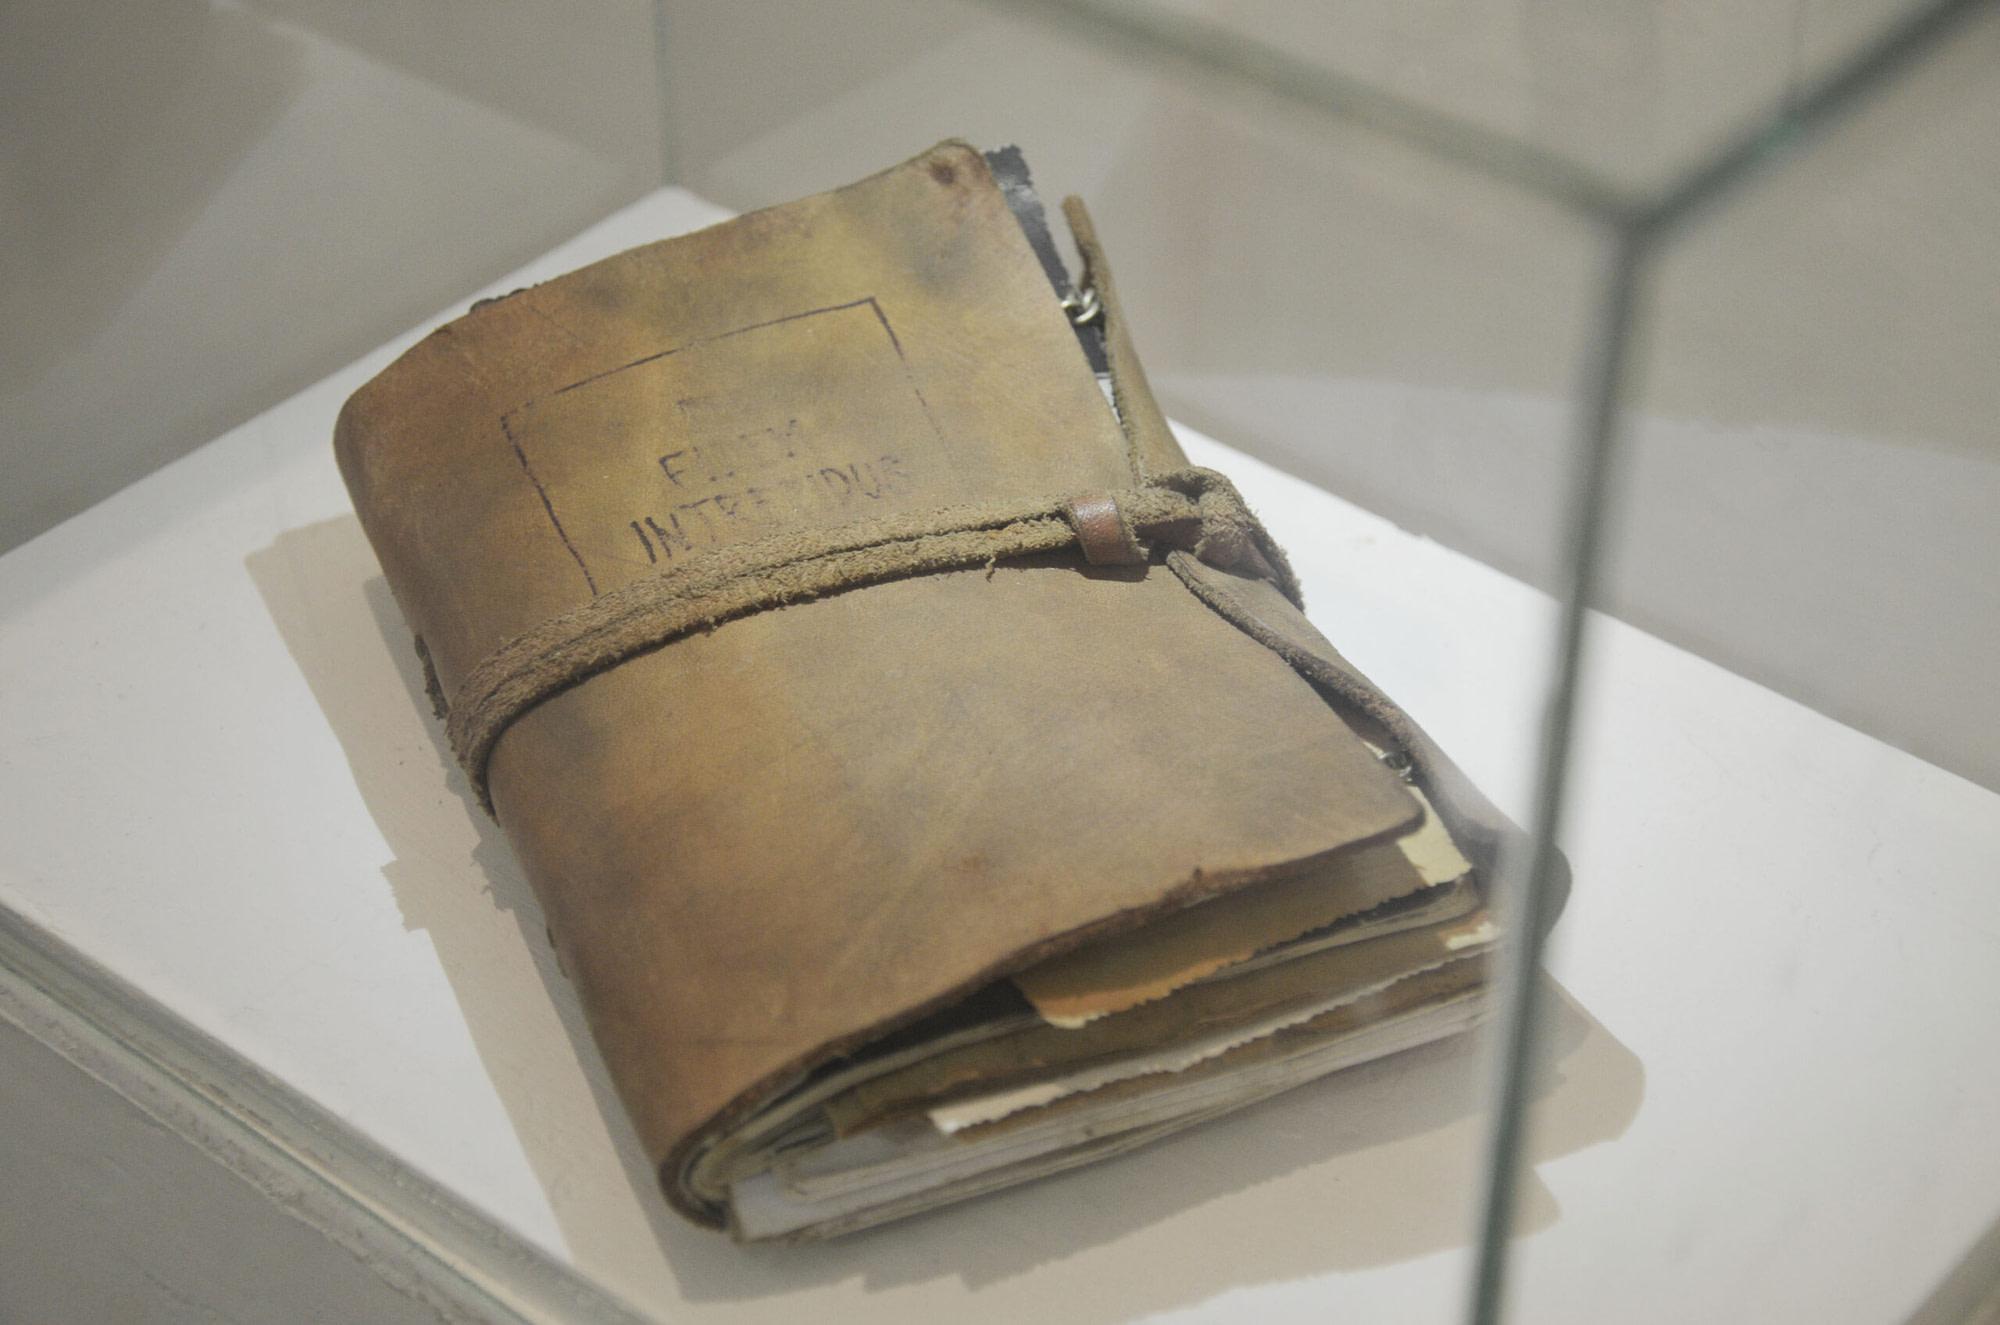 Per Fidem Intrepidus - Manuscripts